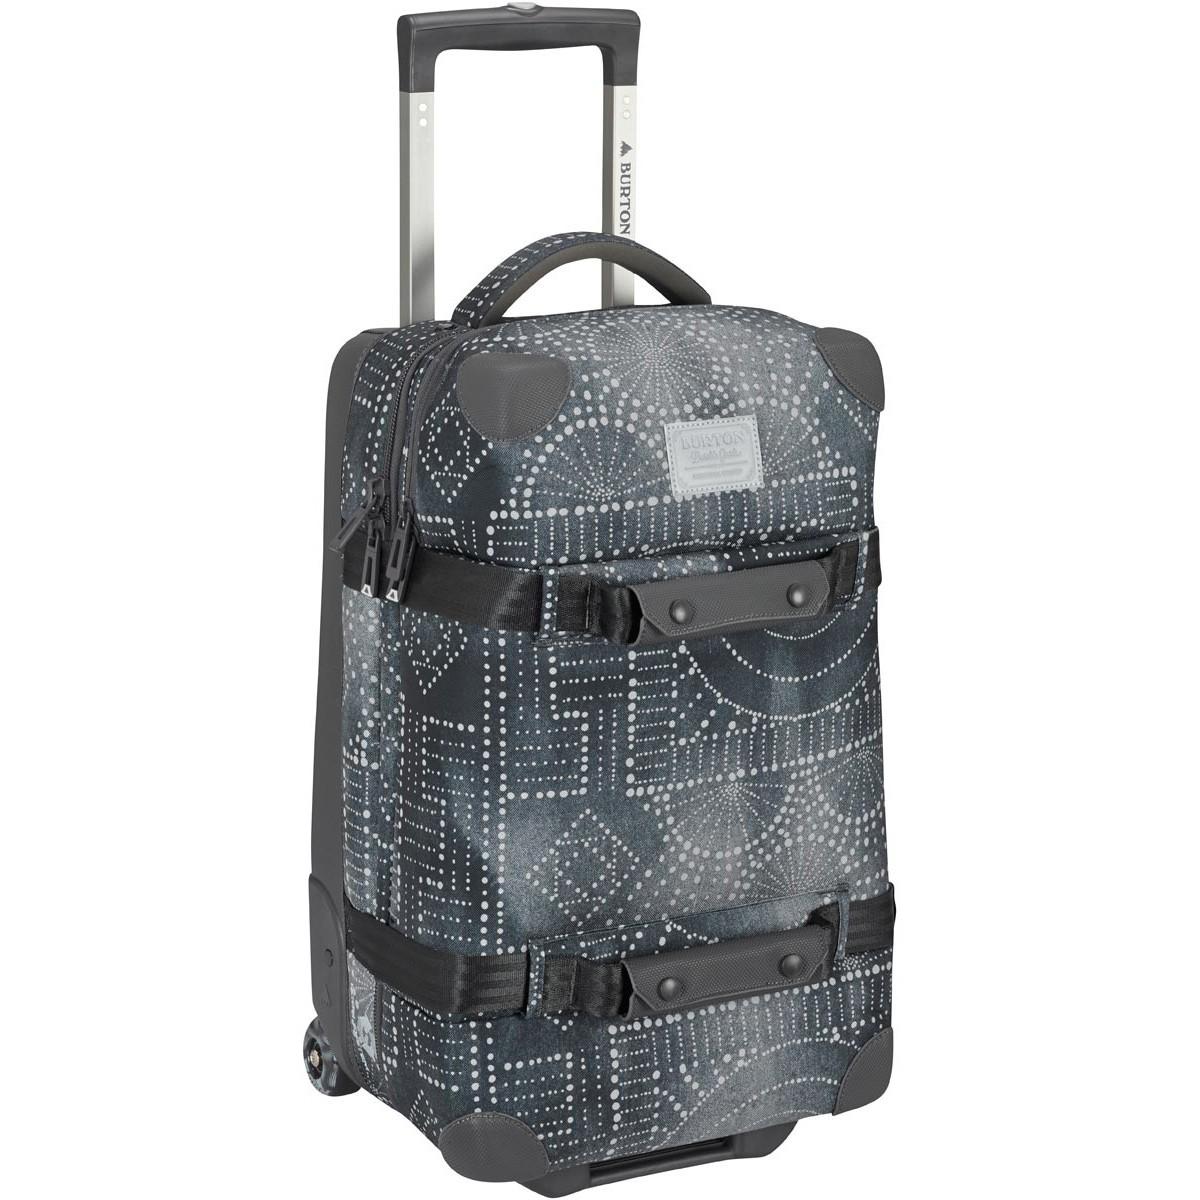 BURTON Wheelie Flight Deck [40L] スーツケース キャリーバッグ